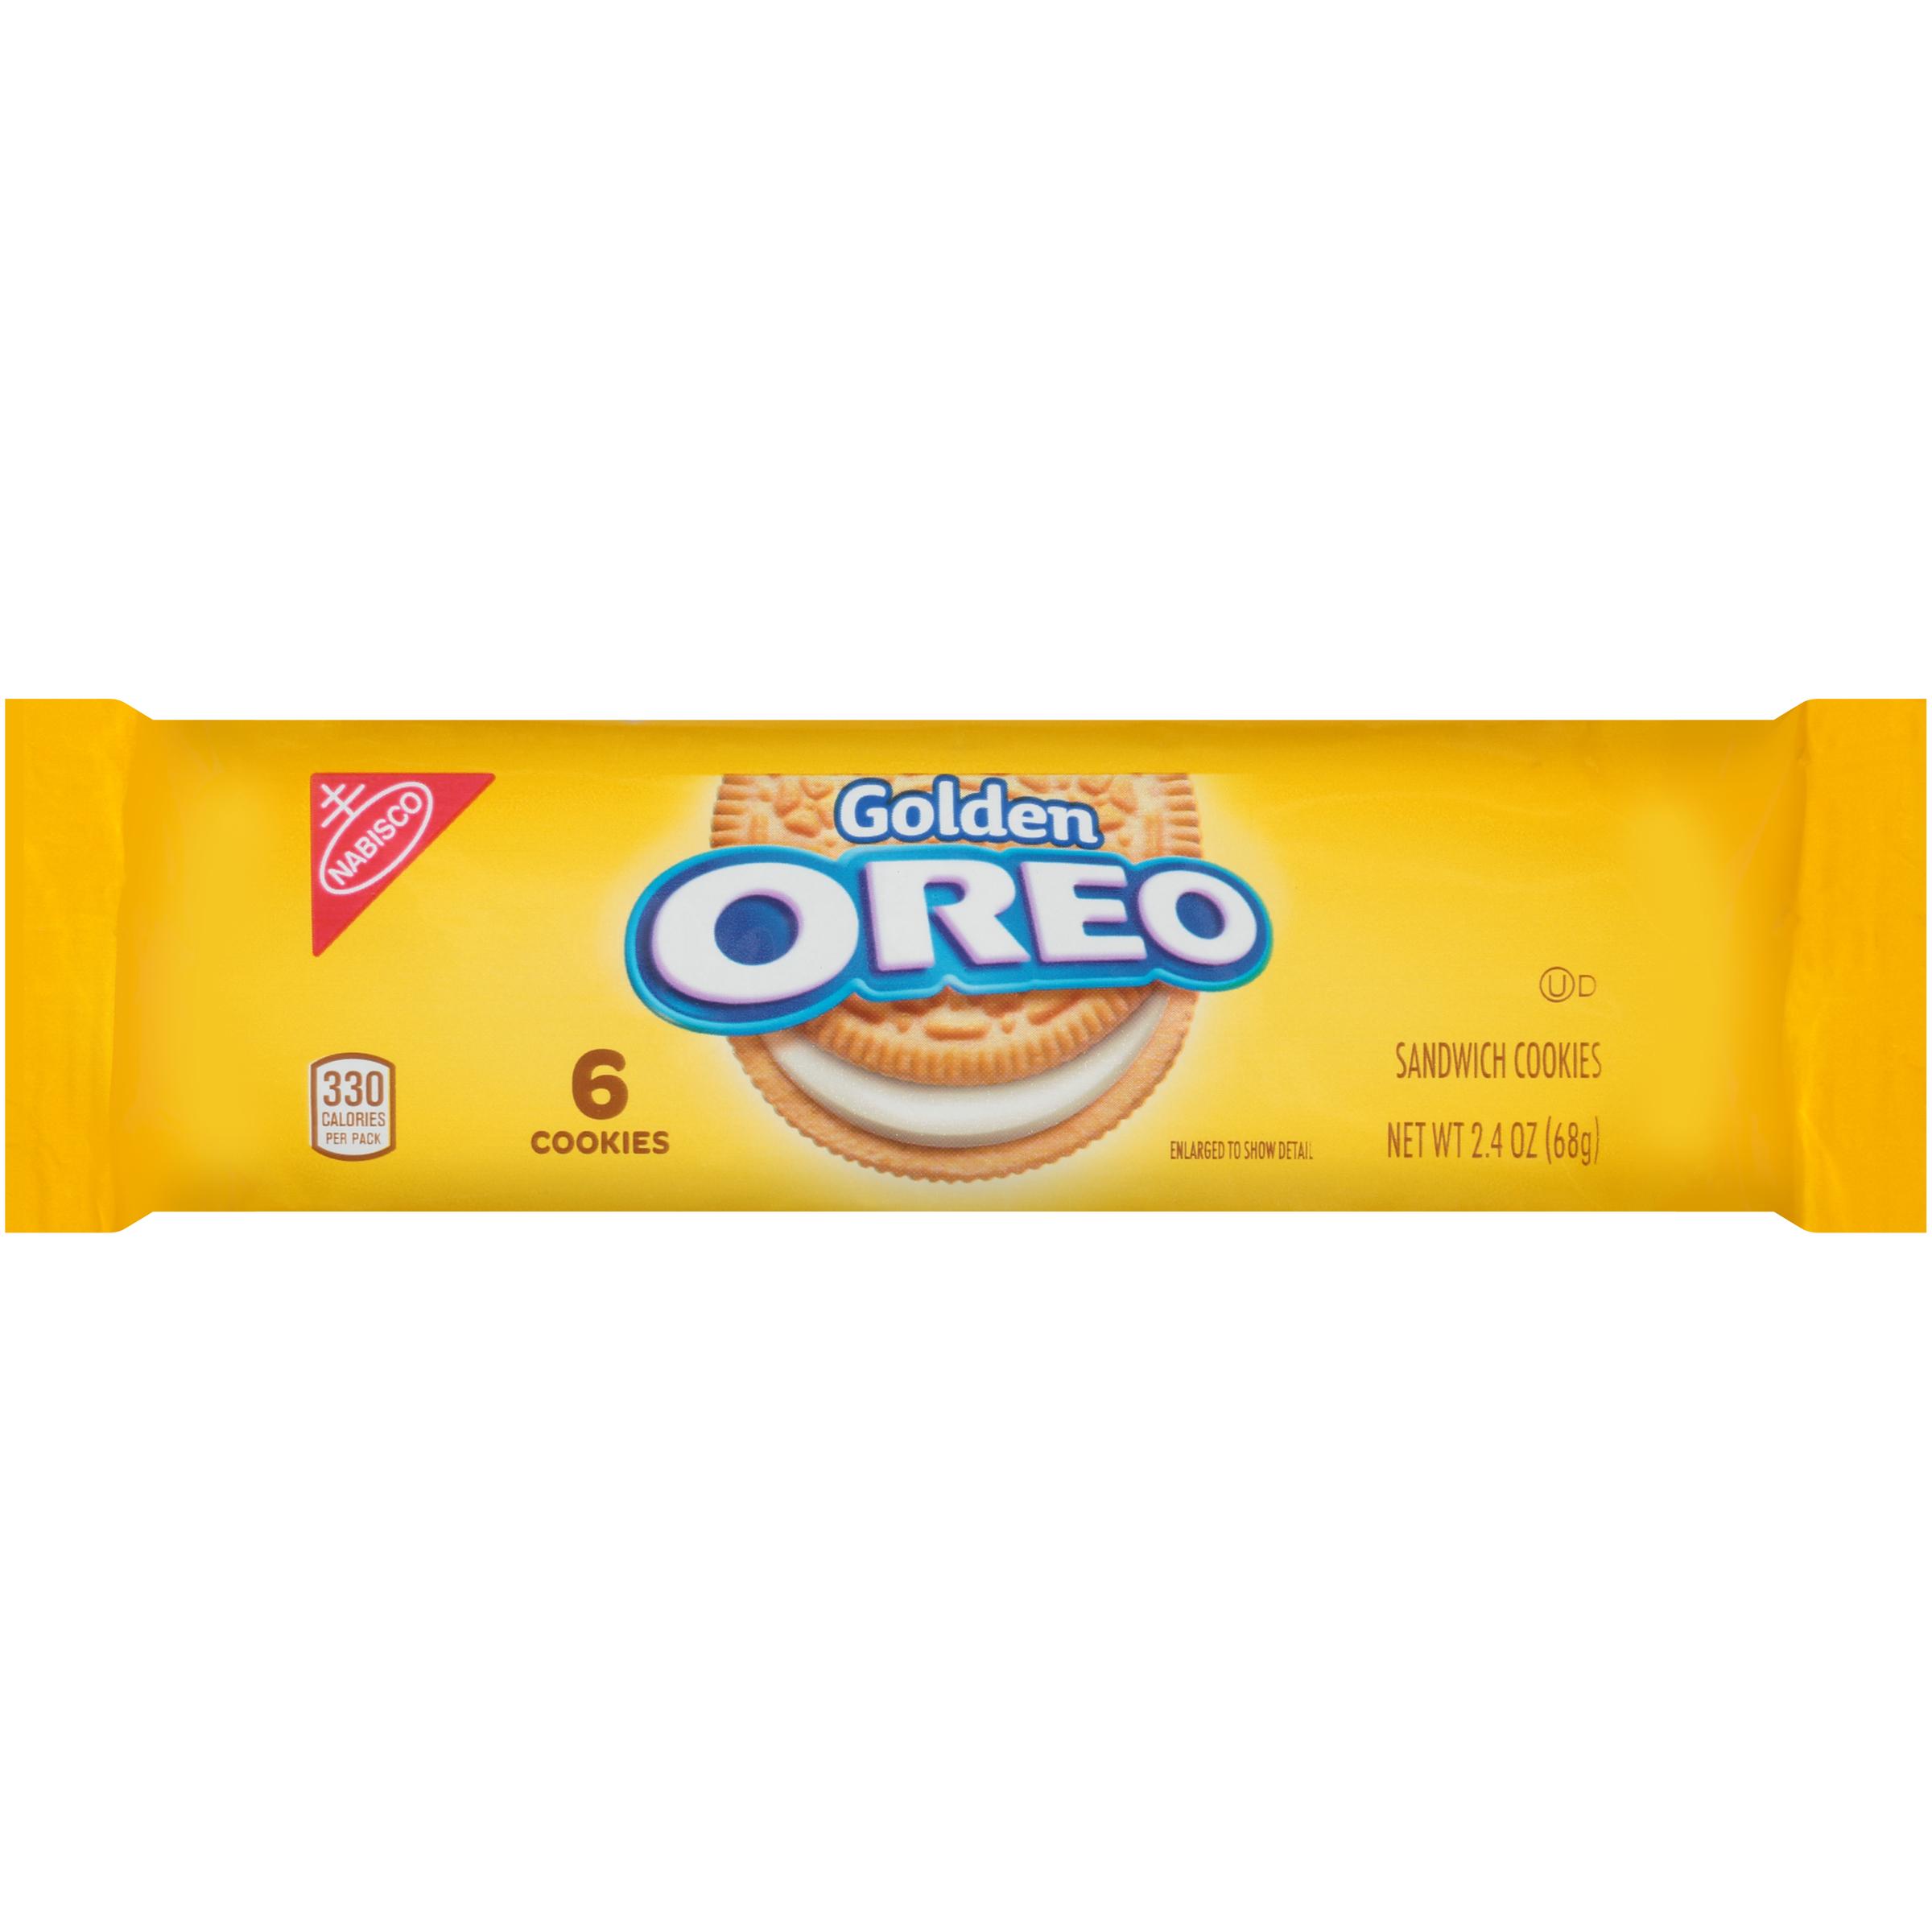 OREO Golden Oreo Cookies-Convenience Pack 2.4 oz